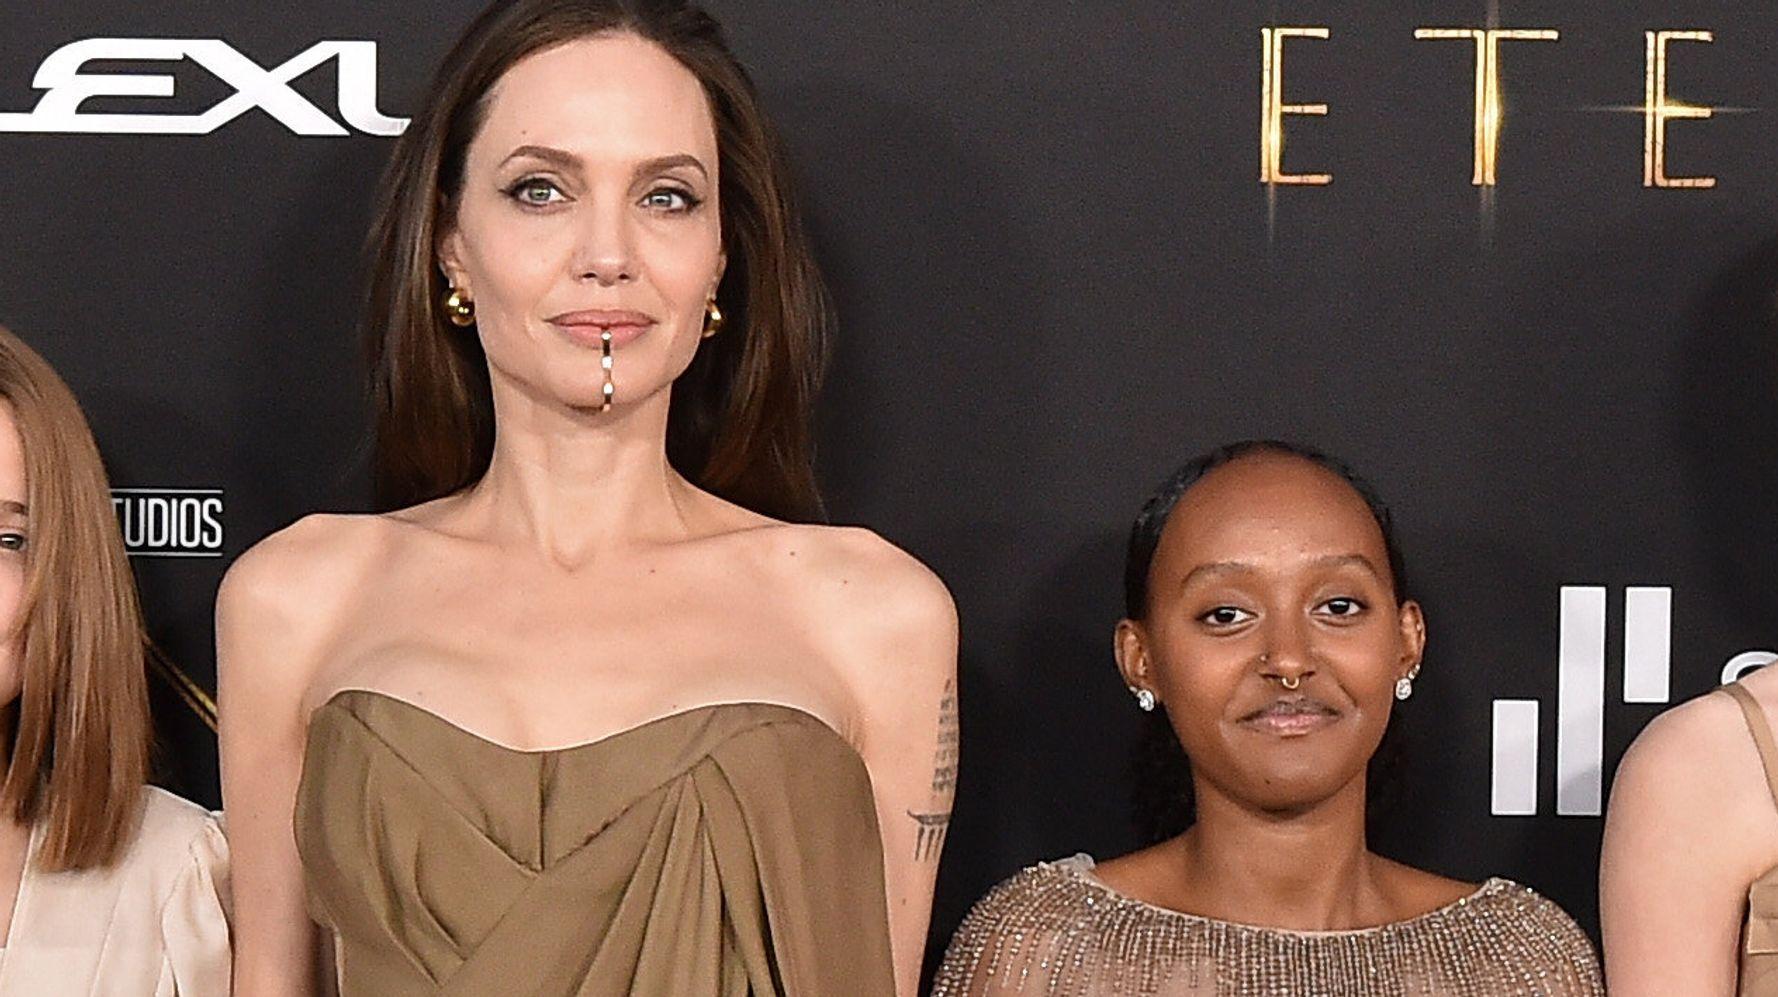 Angelina Jolie Let Daughter Zahara Borrow Her 2014 Oscars Dress For 'Eternals' Premiere